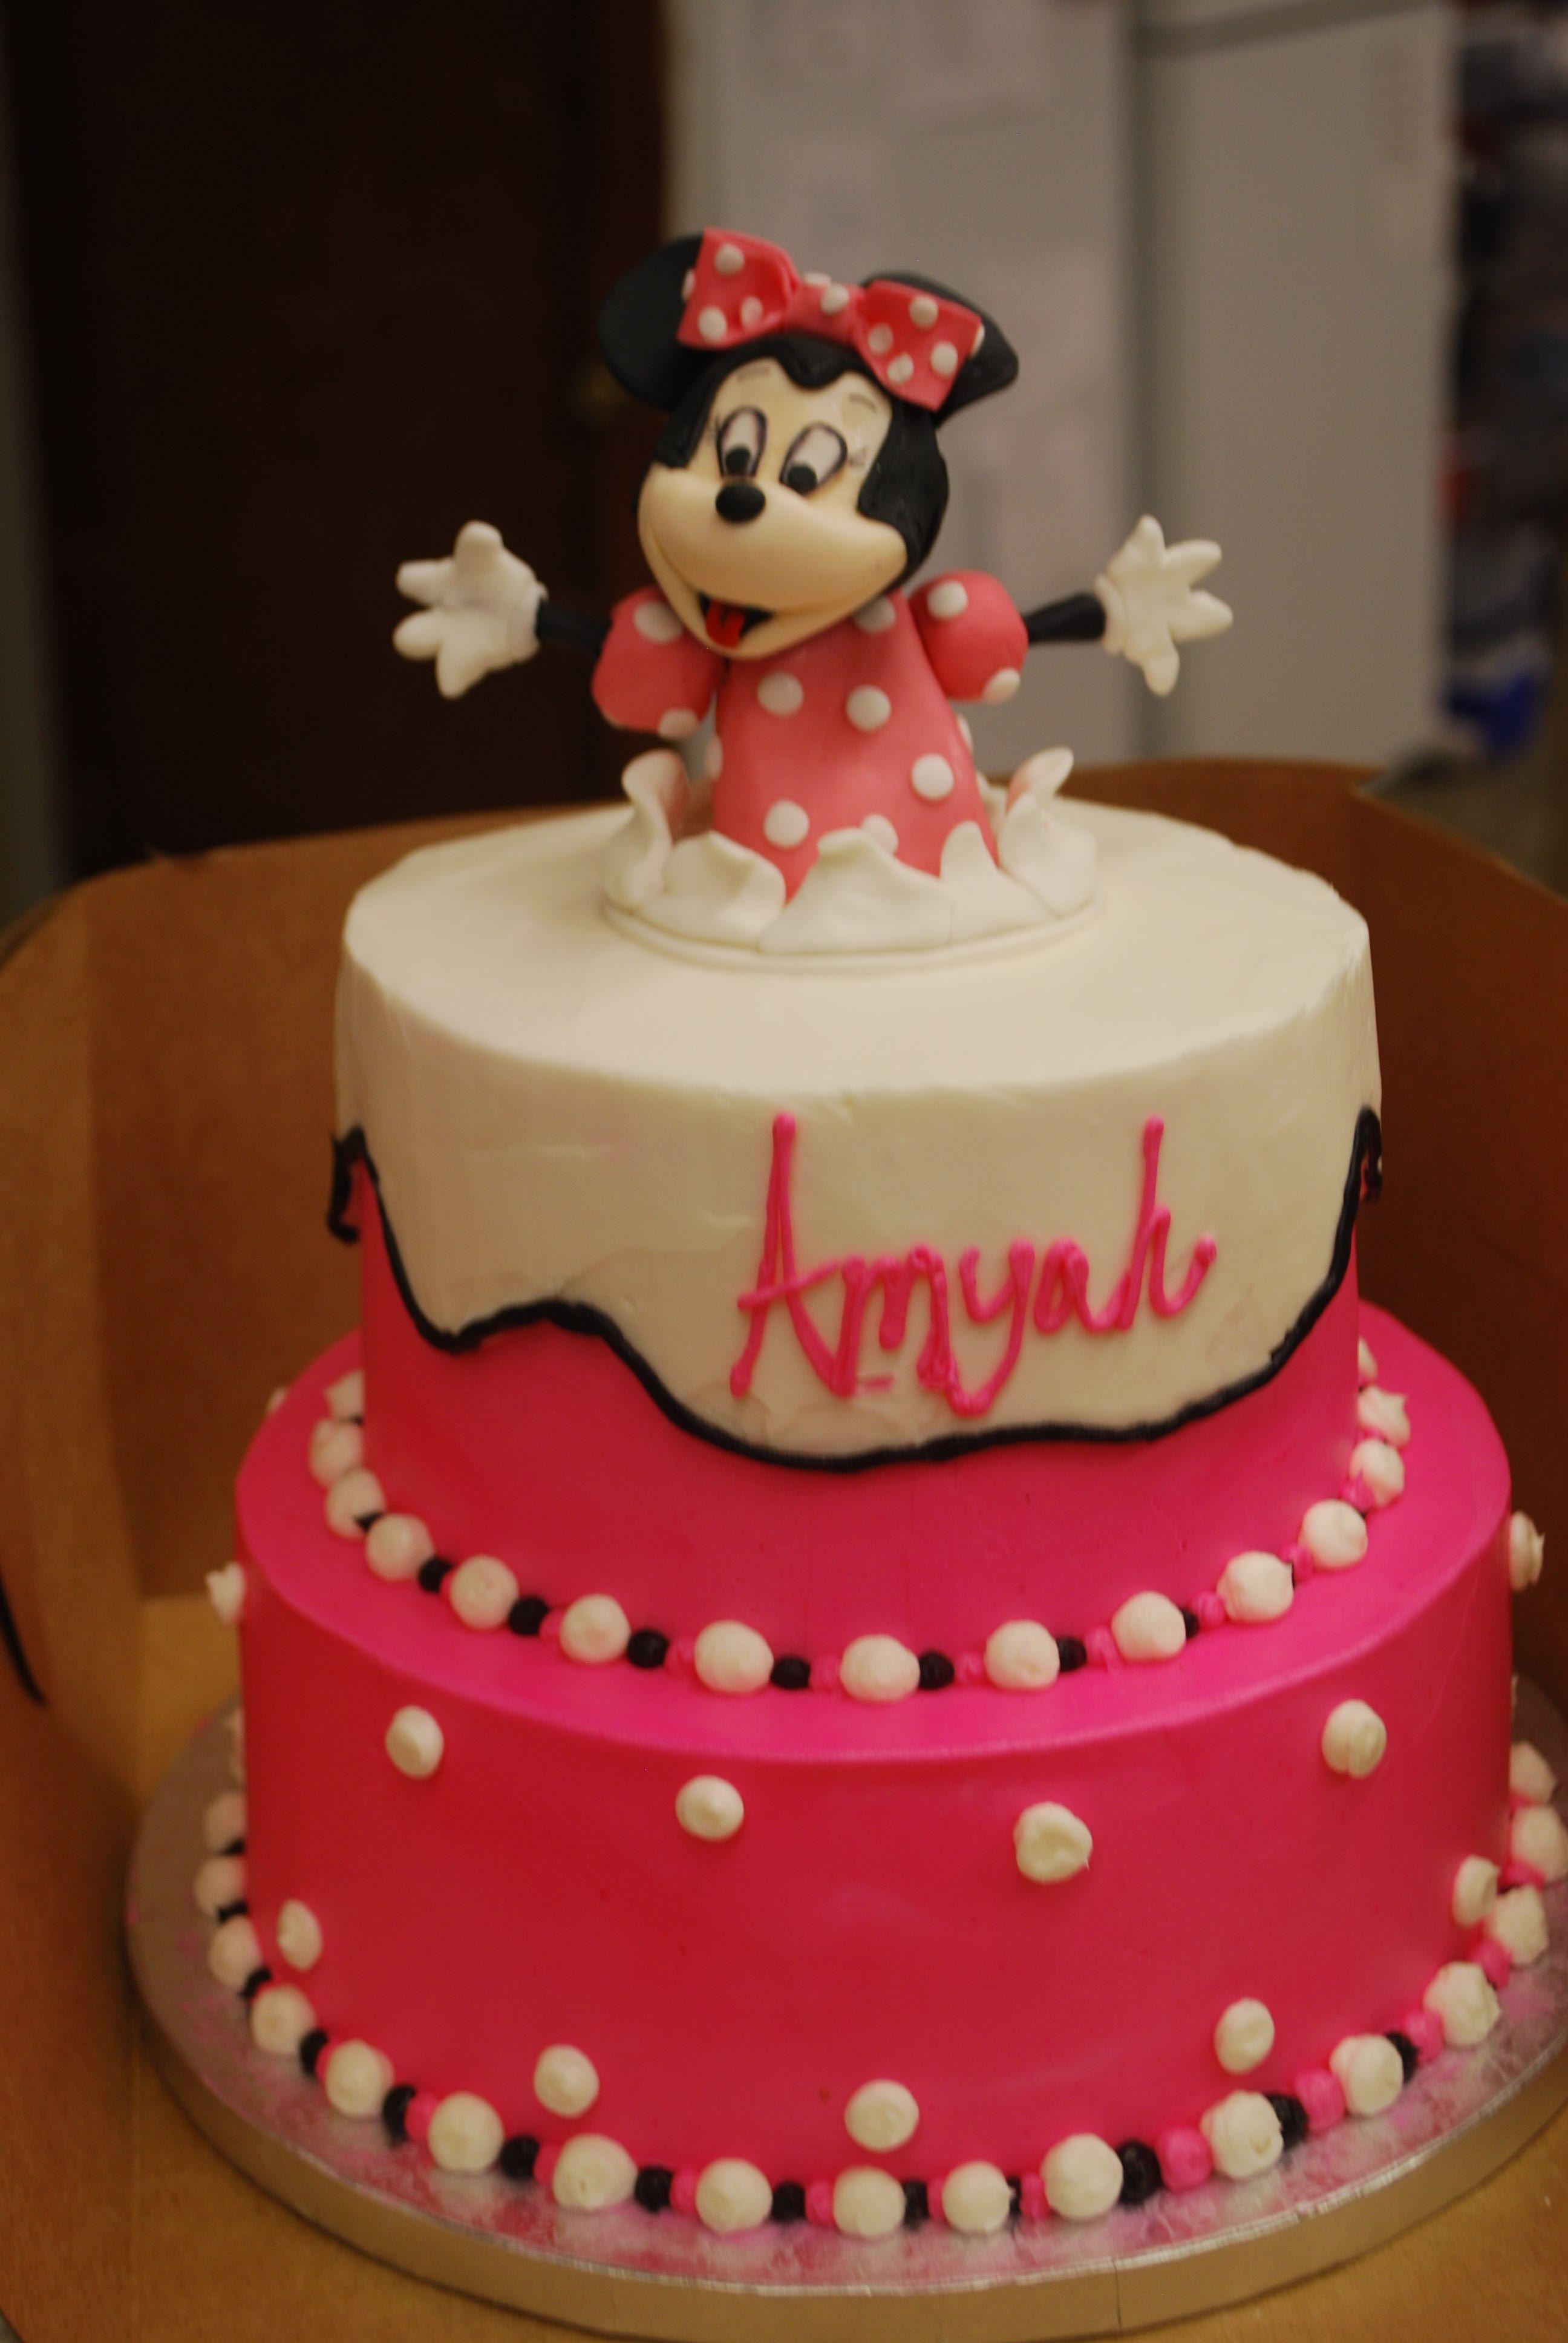 Mini Mouse Cake In 2020 Mini Mouse Cake Cake Decorating